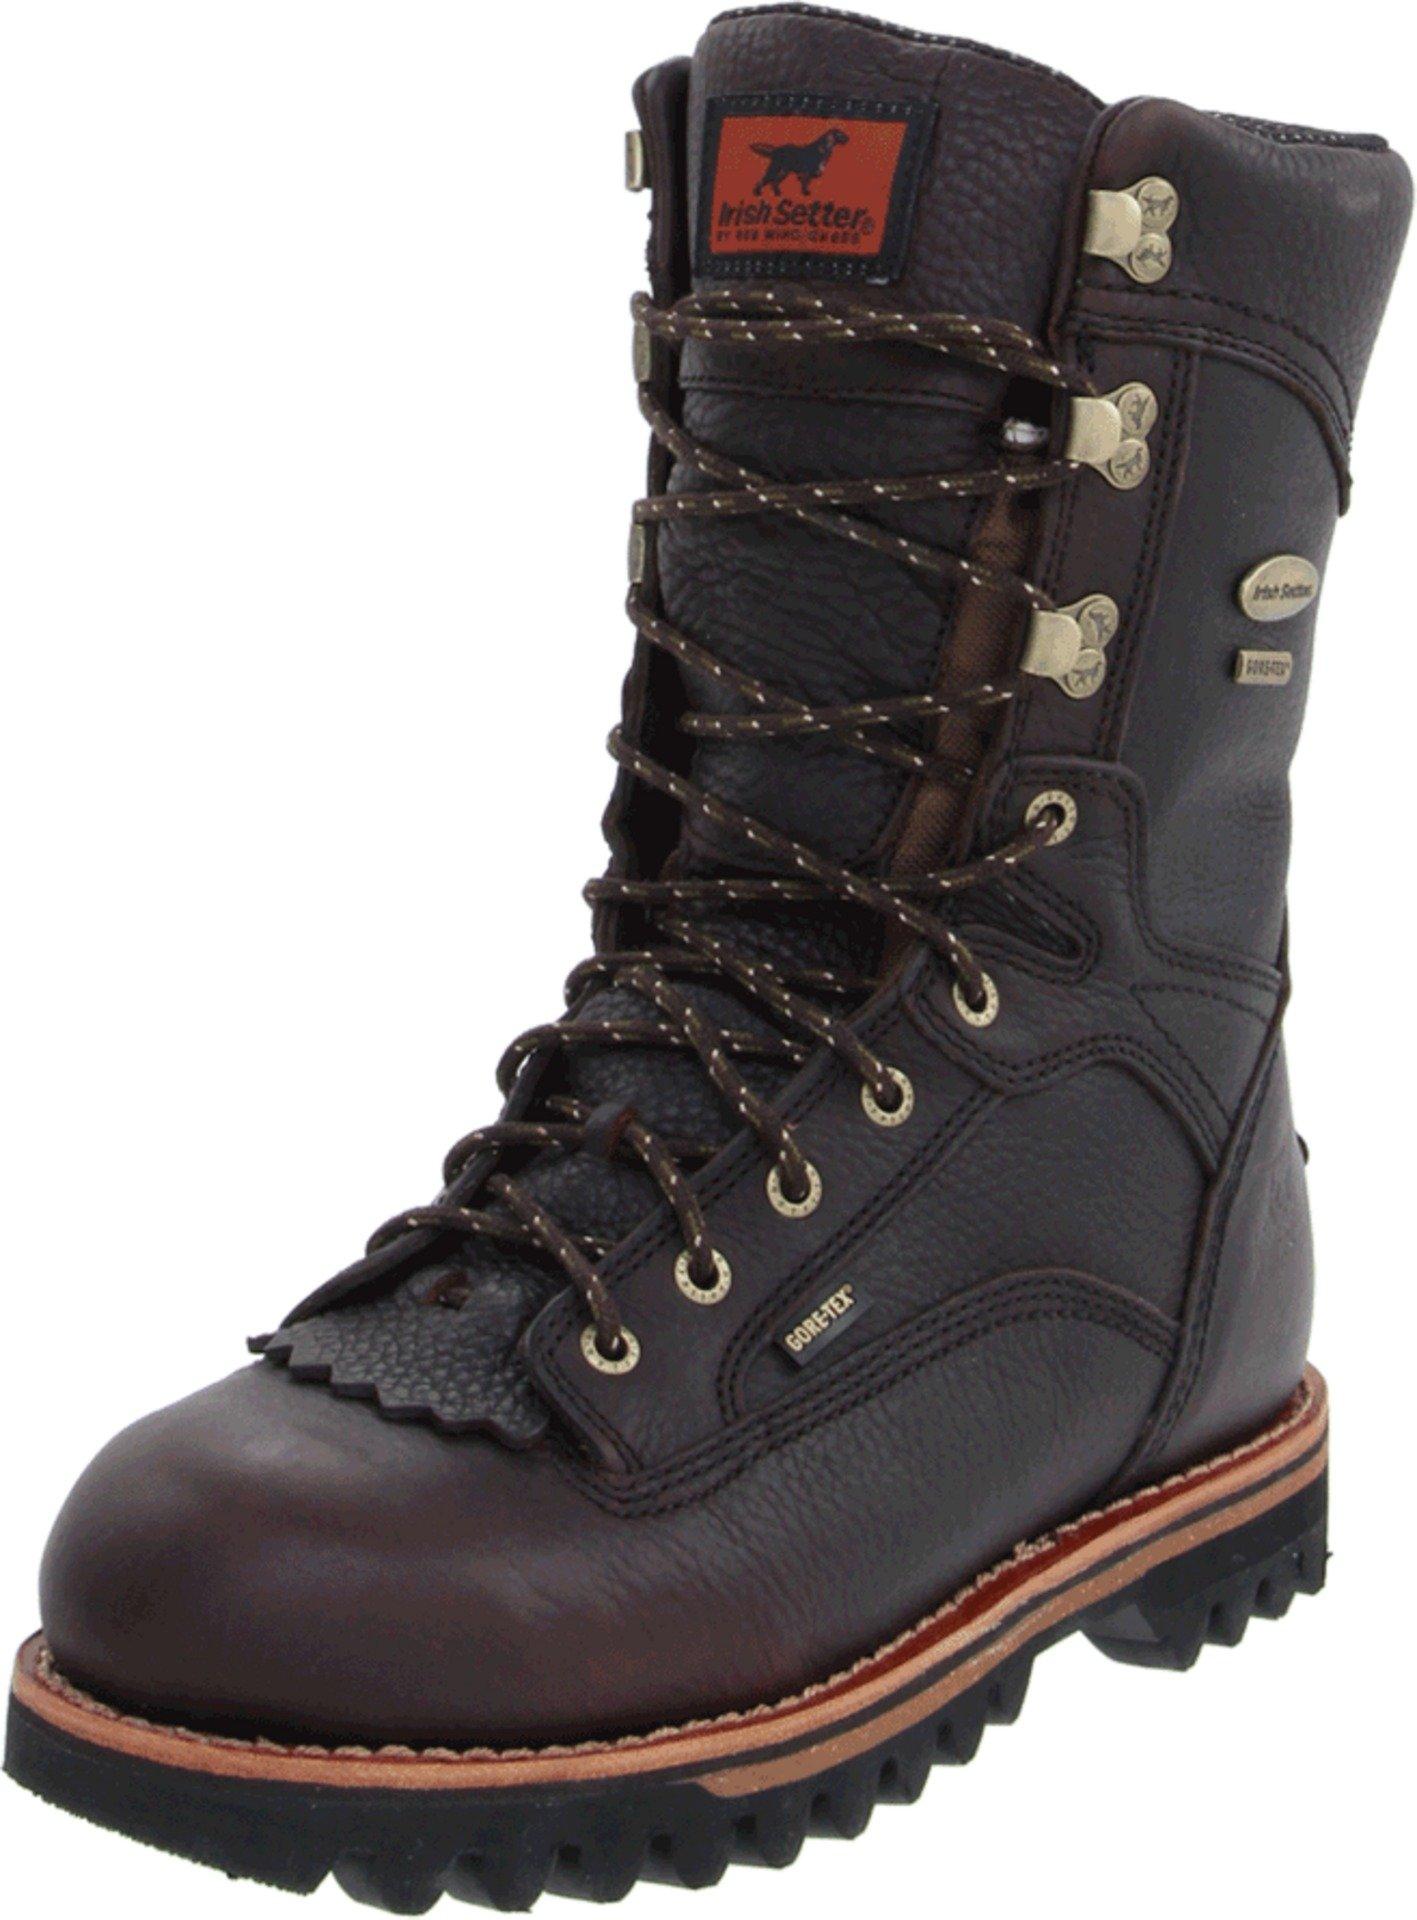 Irish Setter Men's 860 Elk Tracker Waterproof 1000 Gram 12'' Big Game Hunting Boot,Brown,8 D US by Irish Setter